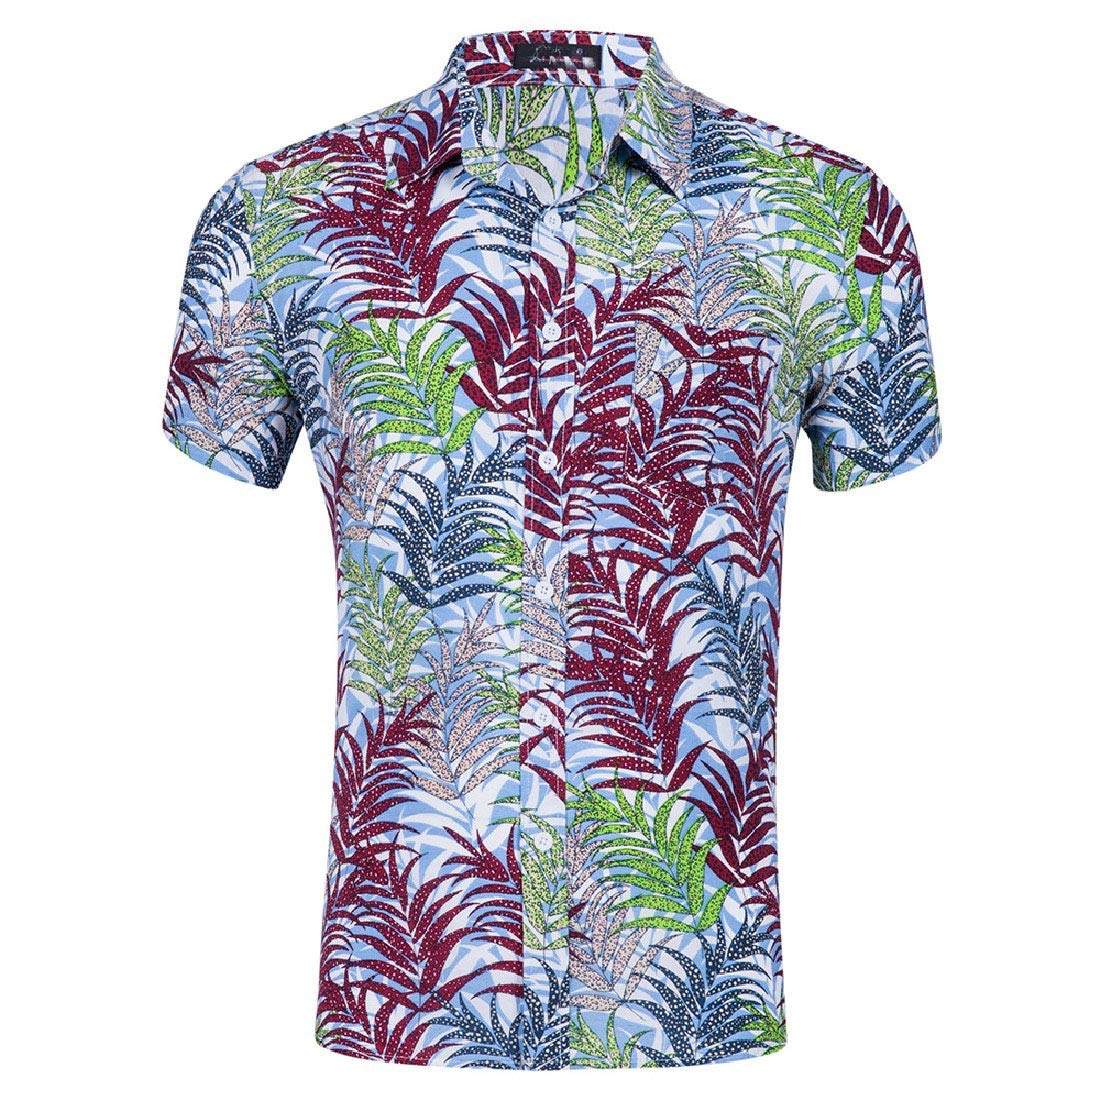 Zimaes-Men Lapel Button Down Short-Sleeve Printed Work Shirt